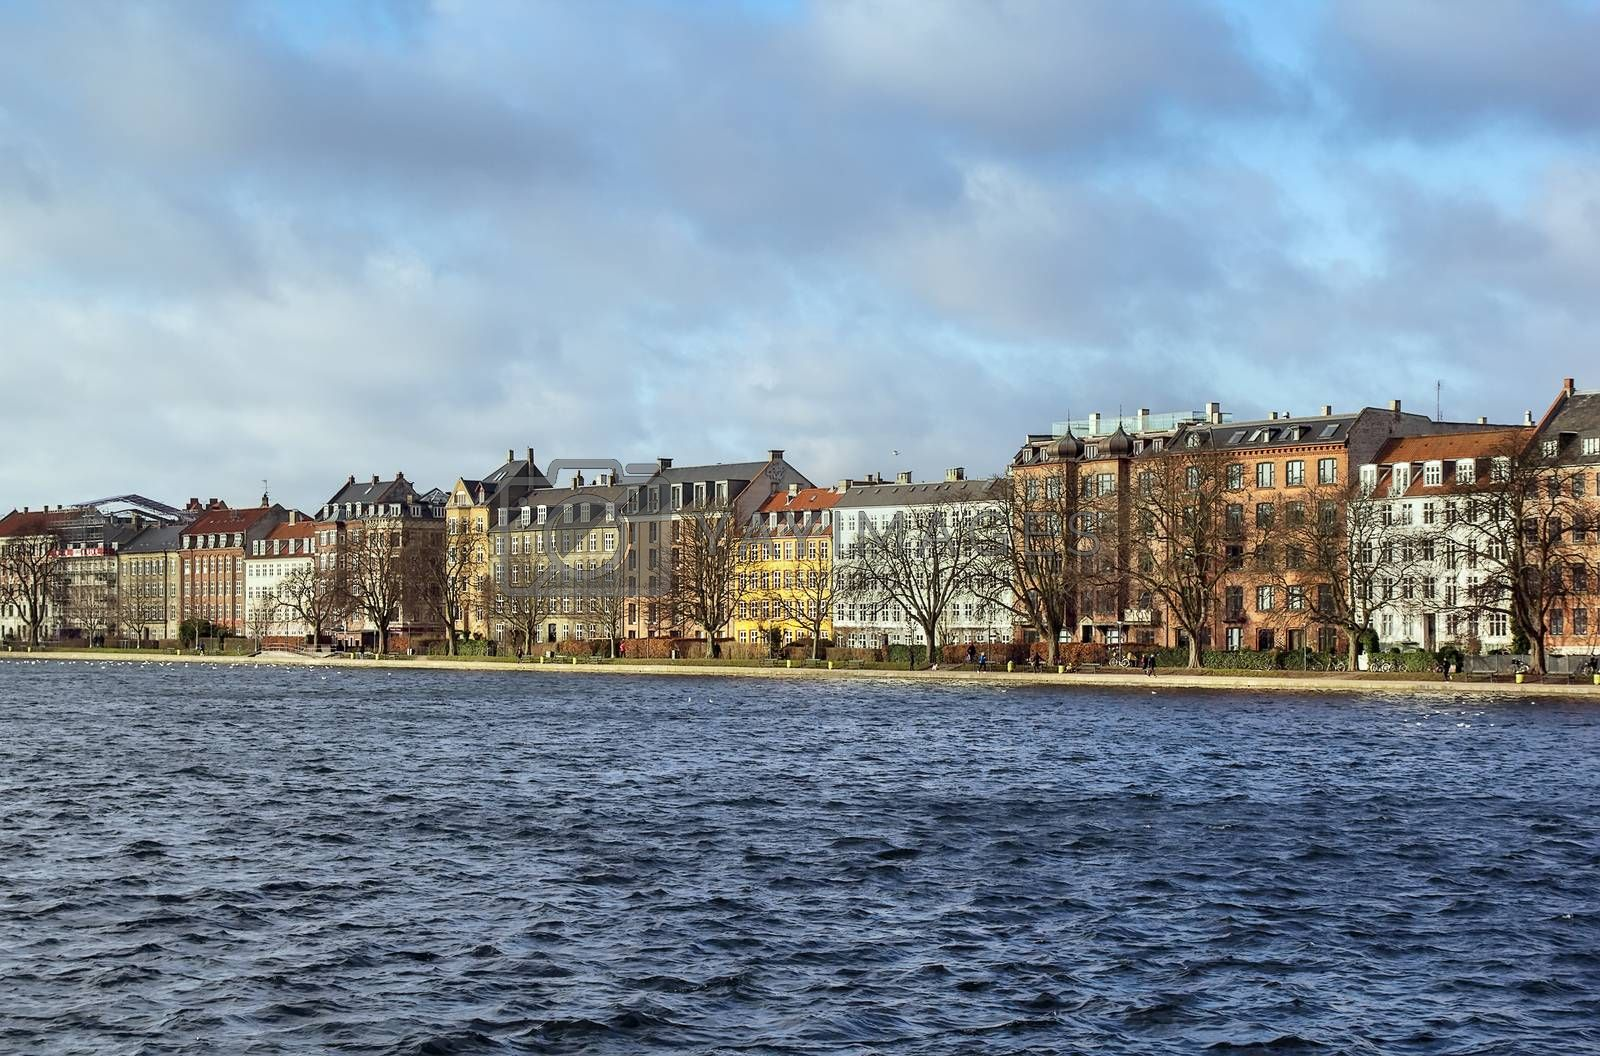 Waterfront Peblinge lake, Copenhagen by borisb17